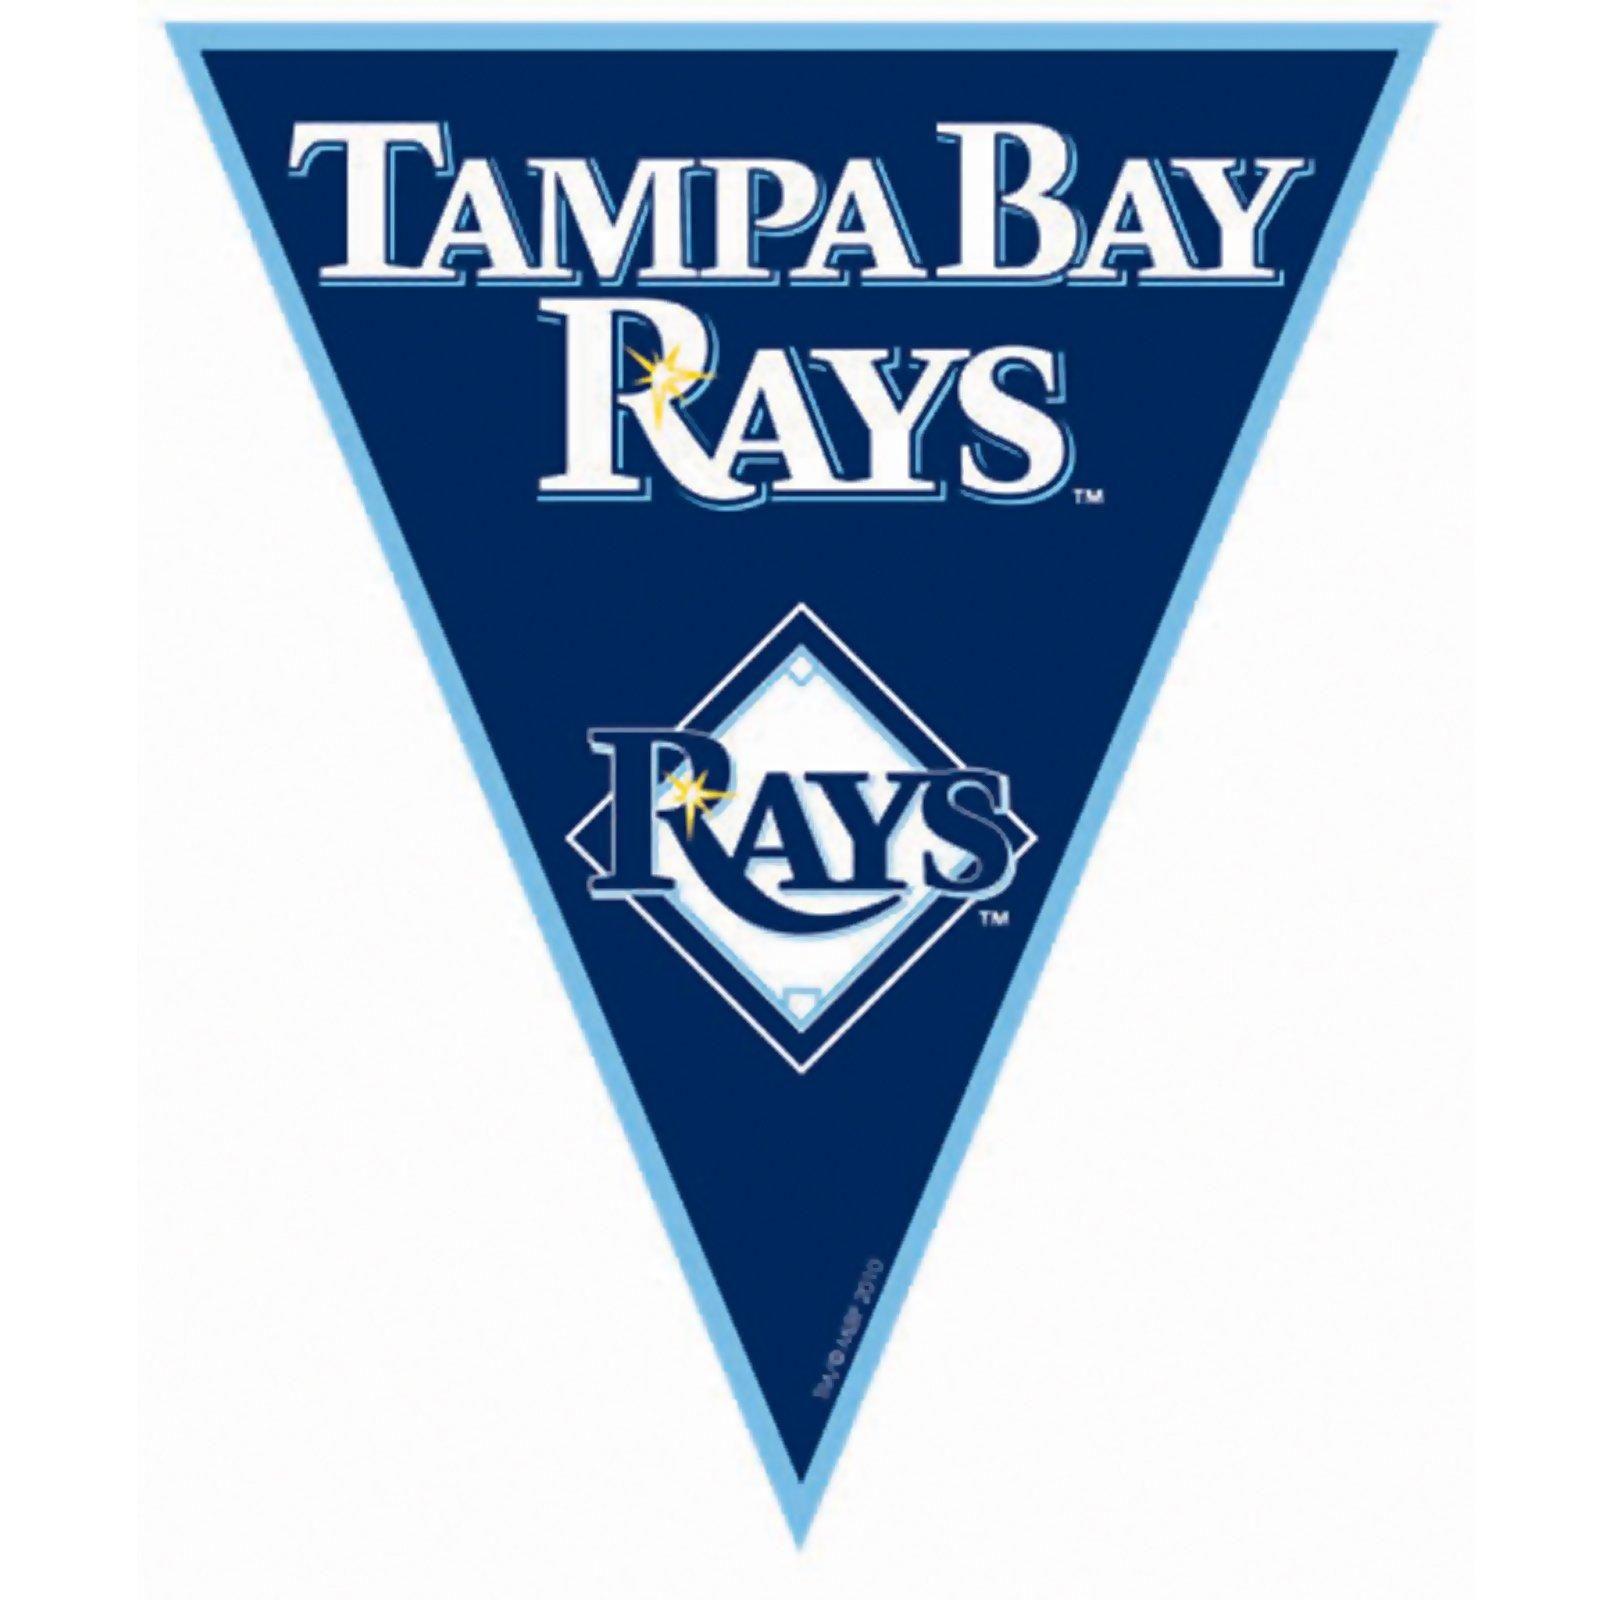 Tampa Bay Rays Baseball Pennant Banner Rays Baseball Tampa Bay Rays Tampa Bay Rays Baseball